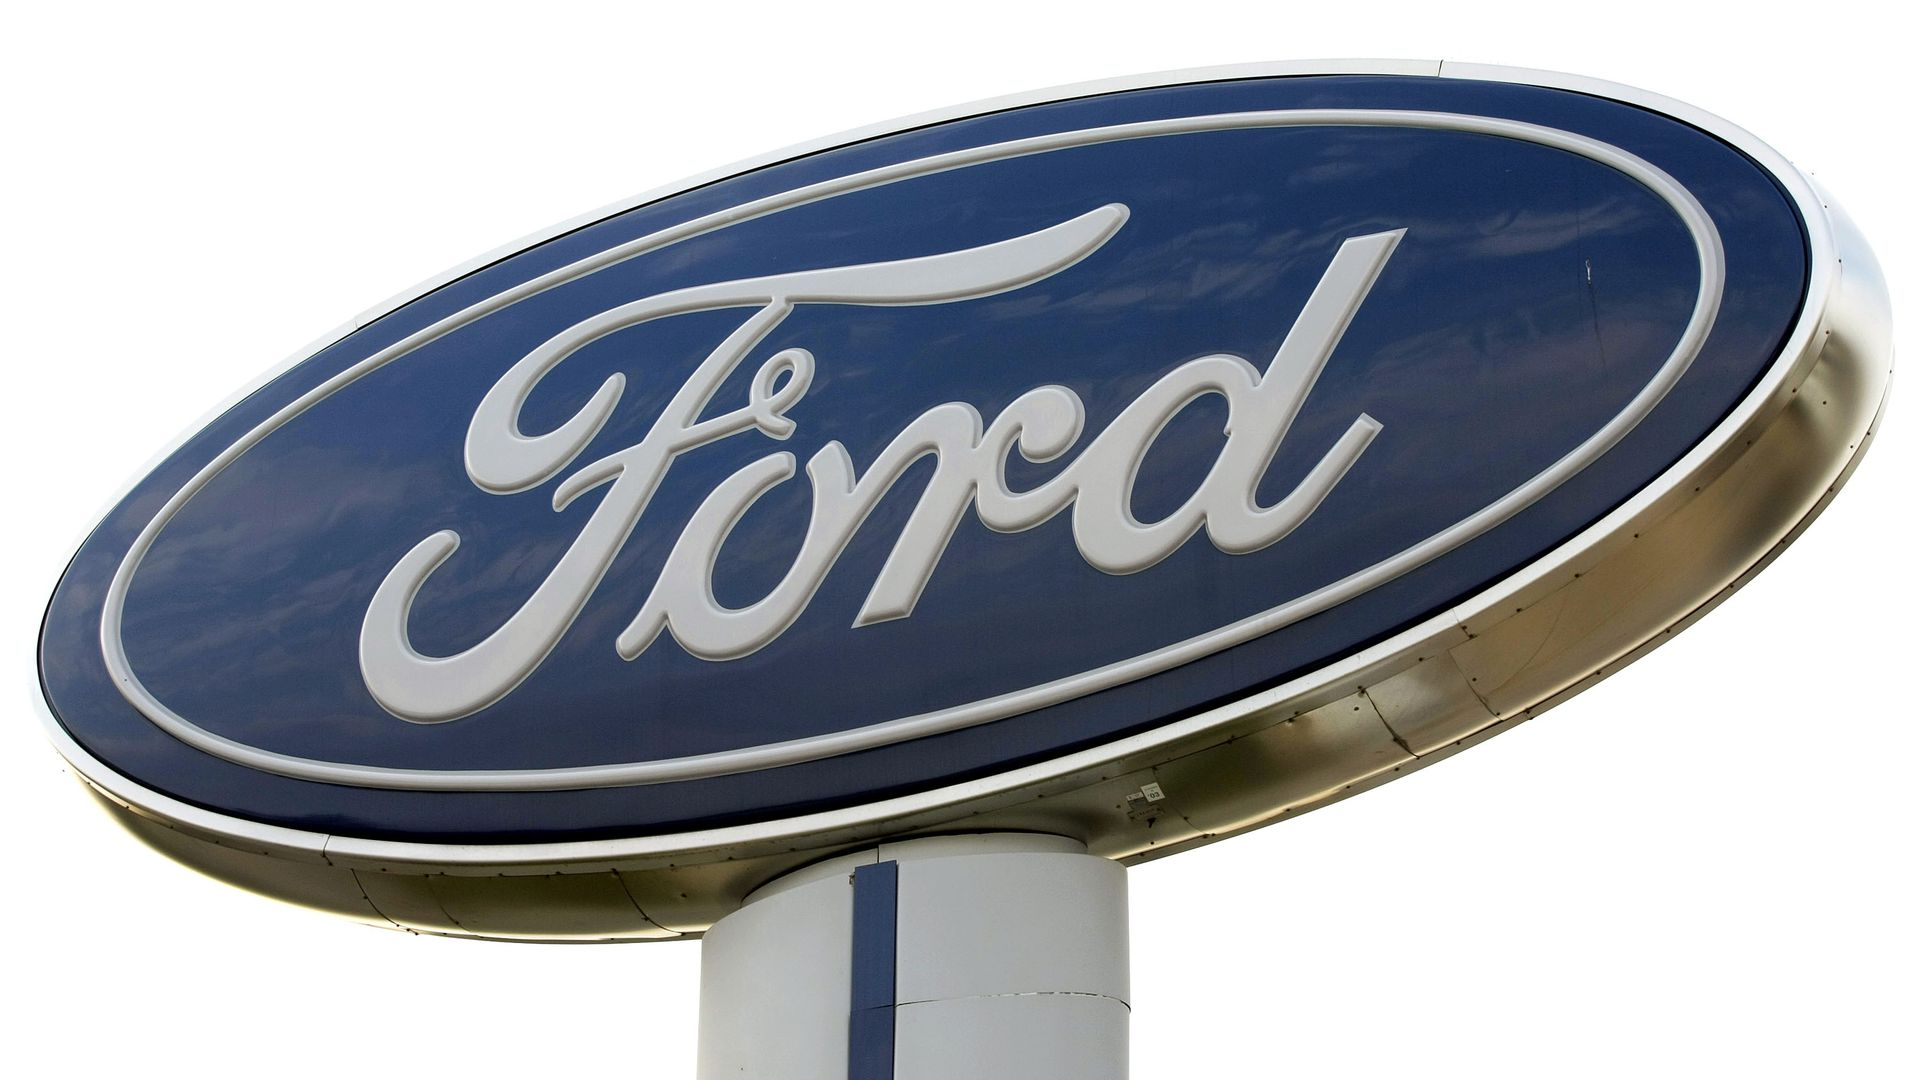 A Ford logo.